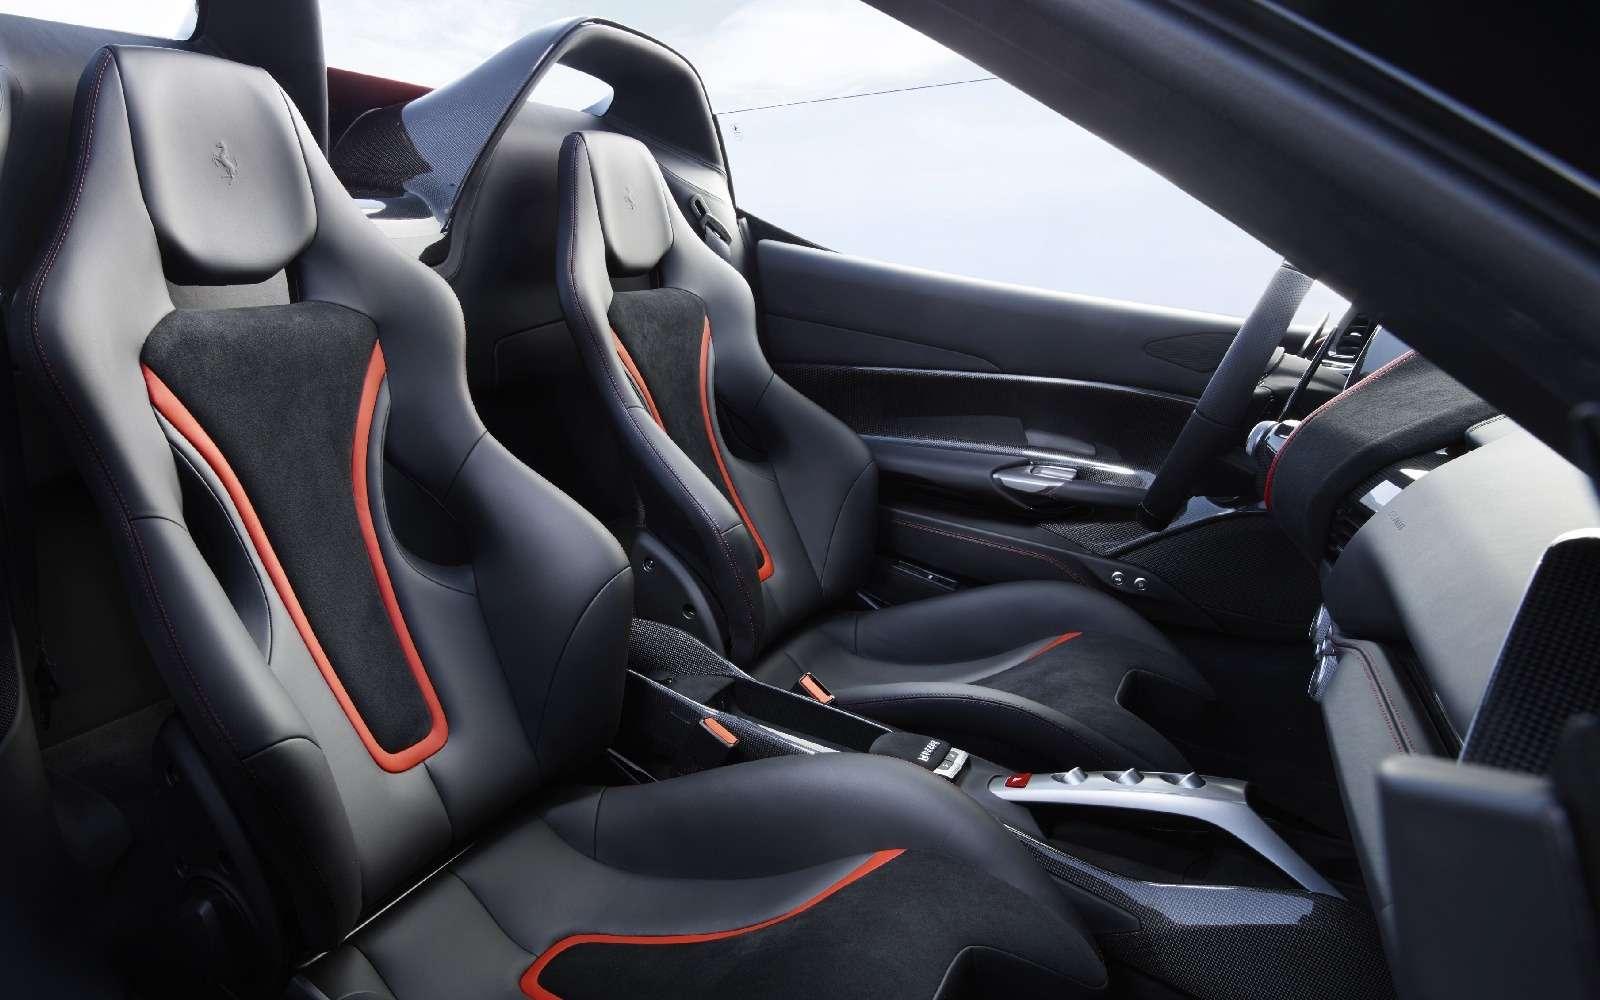 Япония вдохновляет: Ferrari представила юбилейную таргу J50— фото 677907